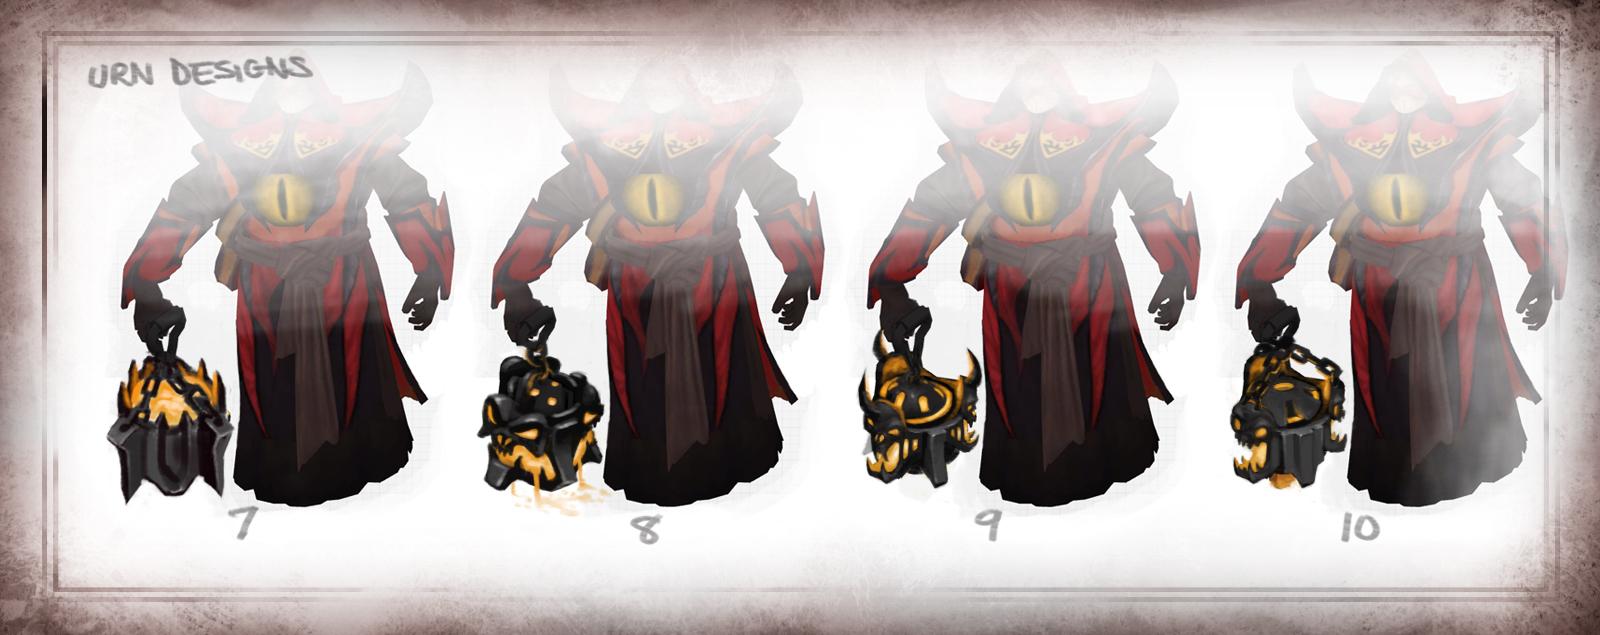 Warlock_Concepts_Urns01.jpg